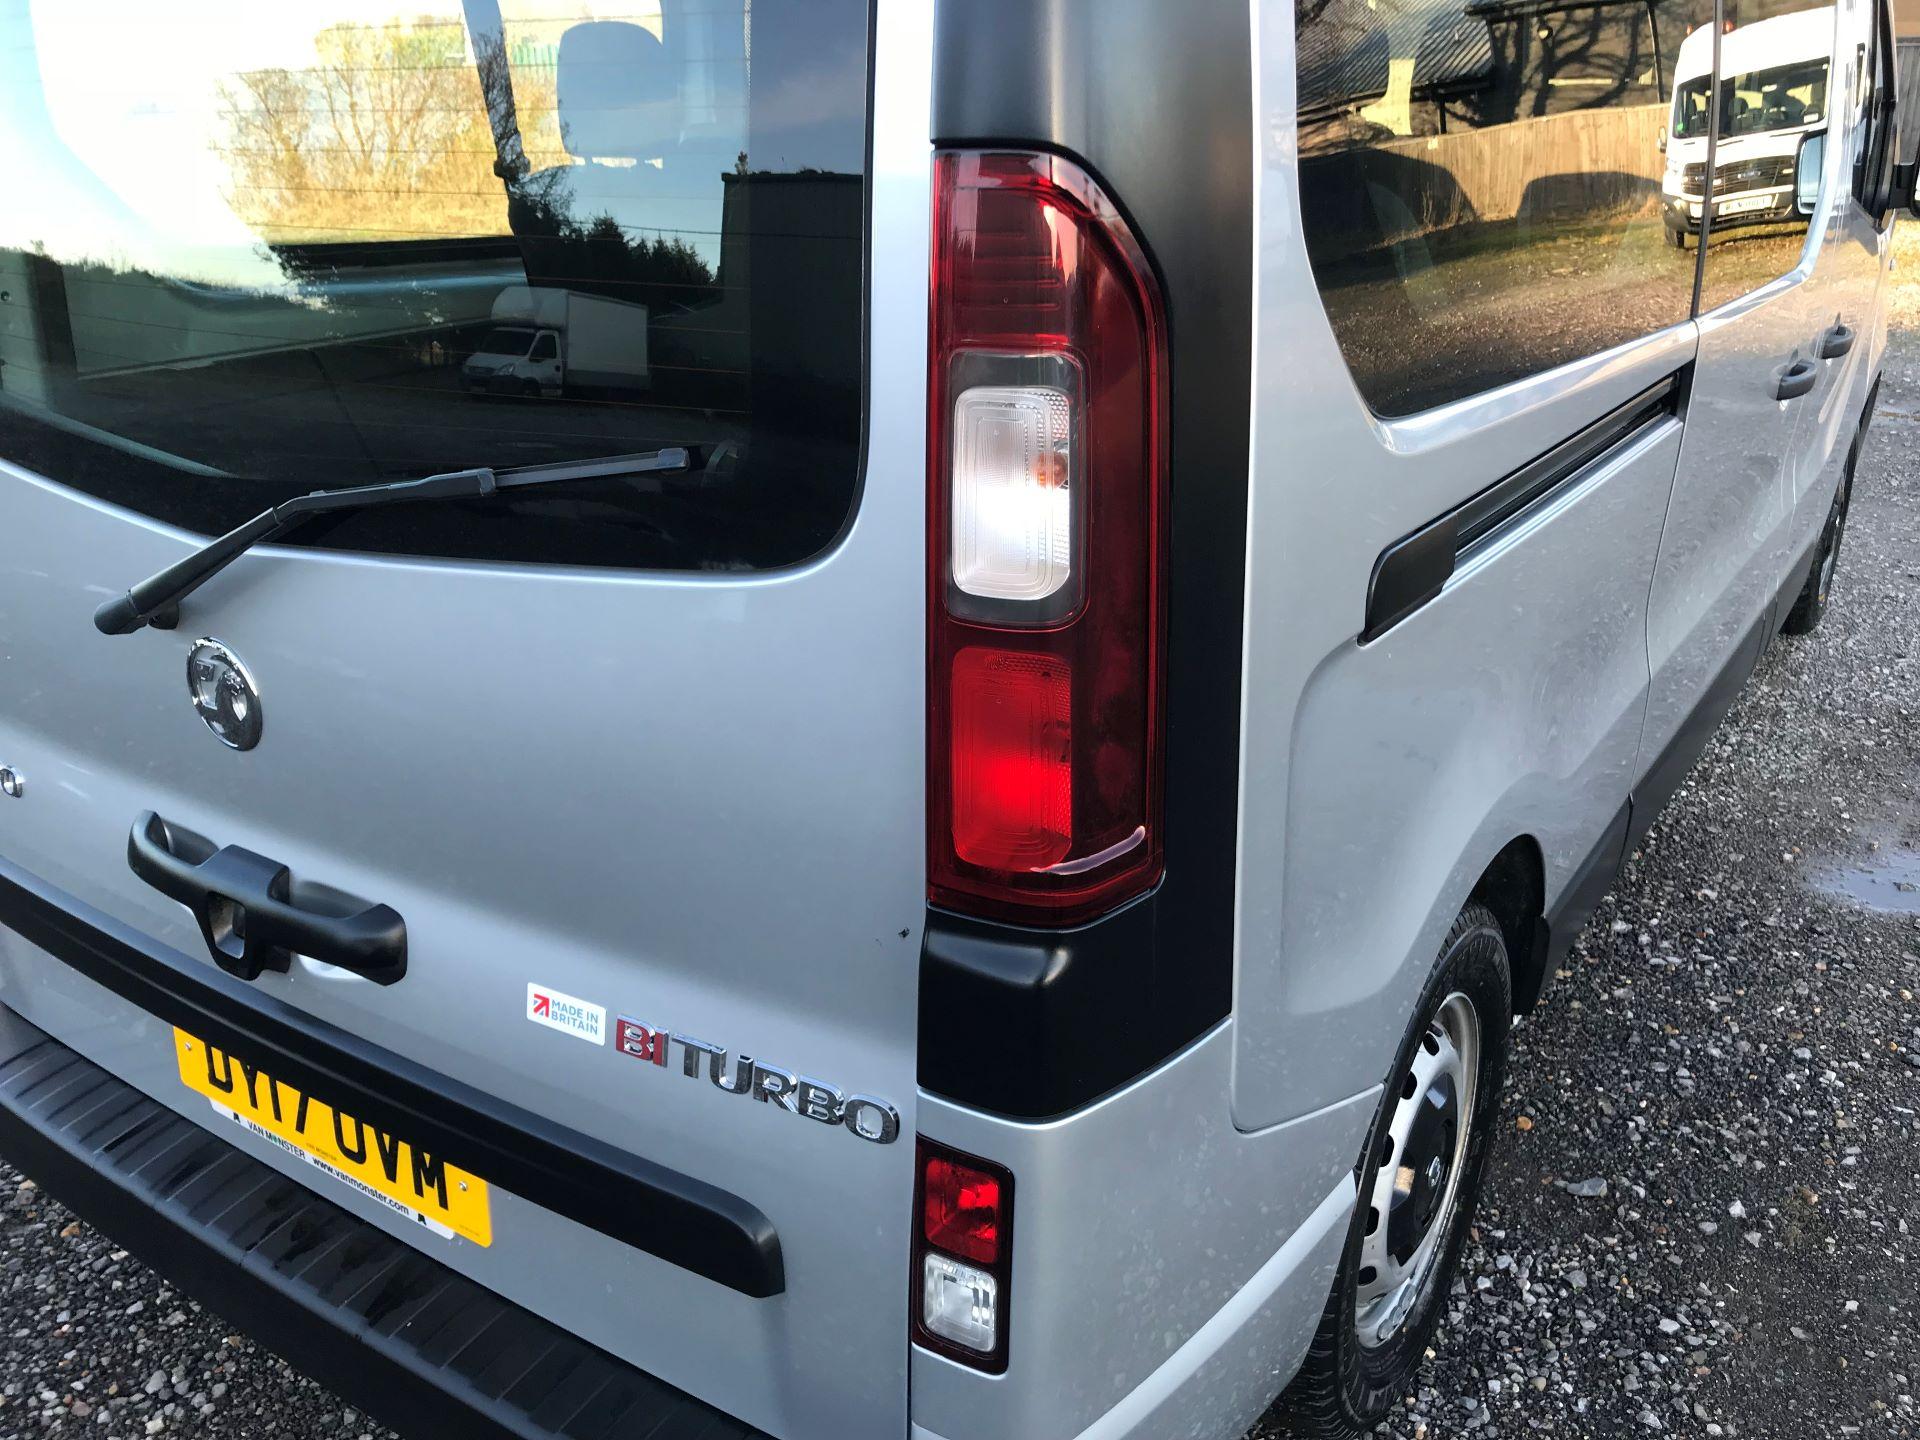 2017 Vauxhall Vivaro 2900 1.6Cdti Biturbo 125Ps H1 Combi 9 Seat (DY17UVM) Image 17